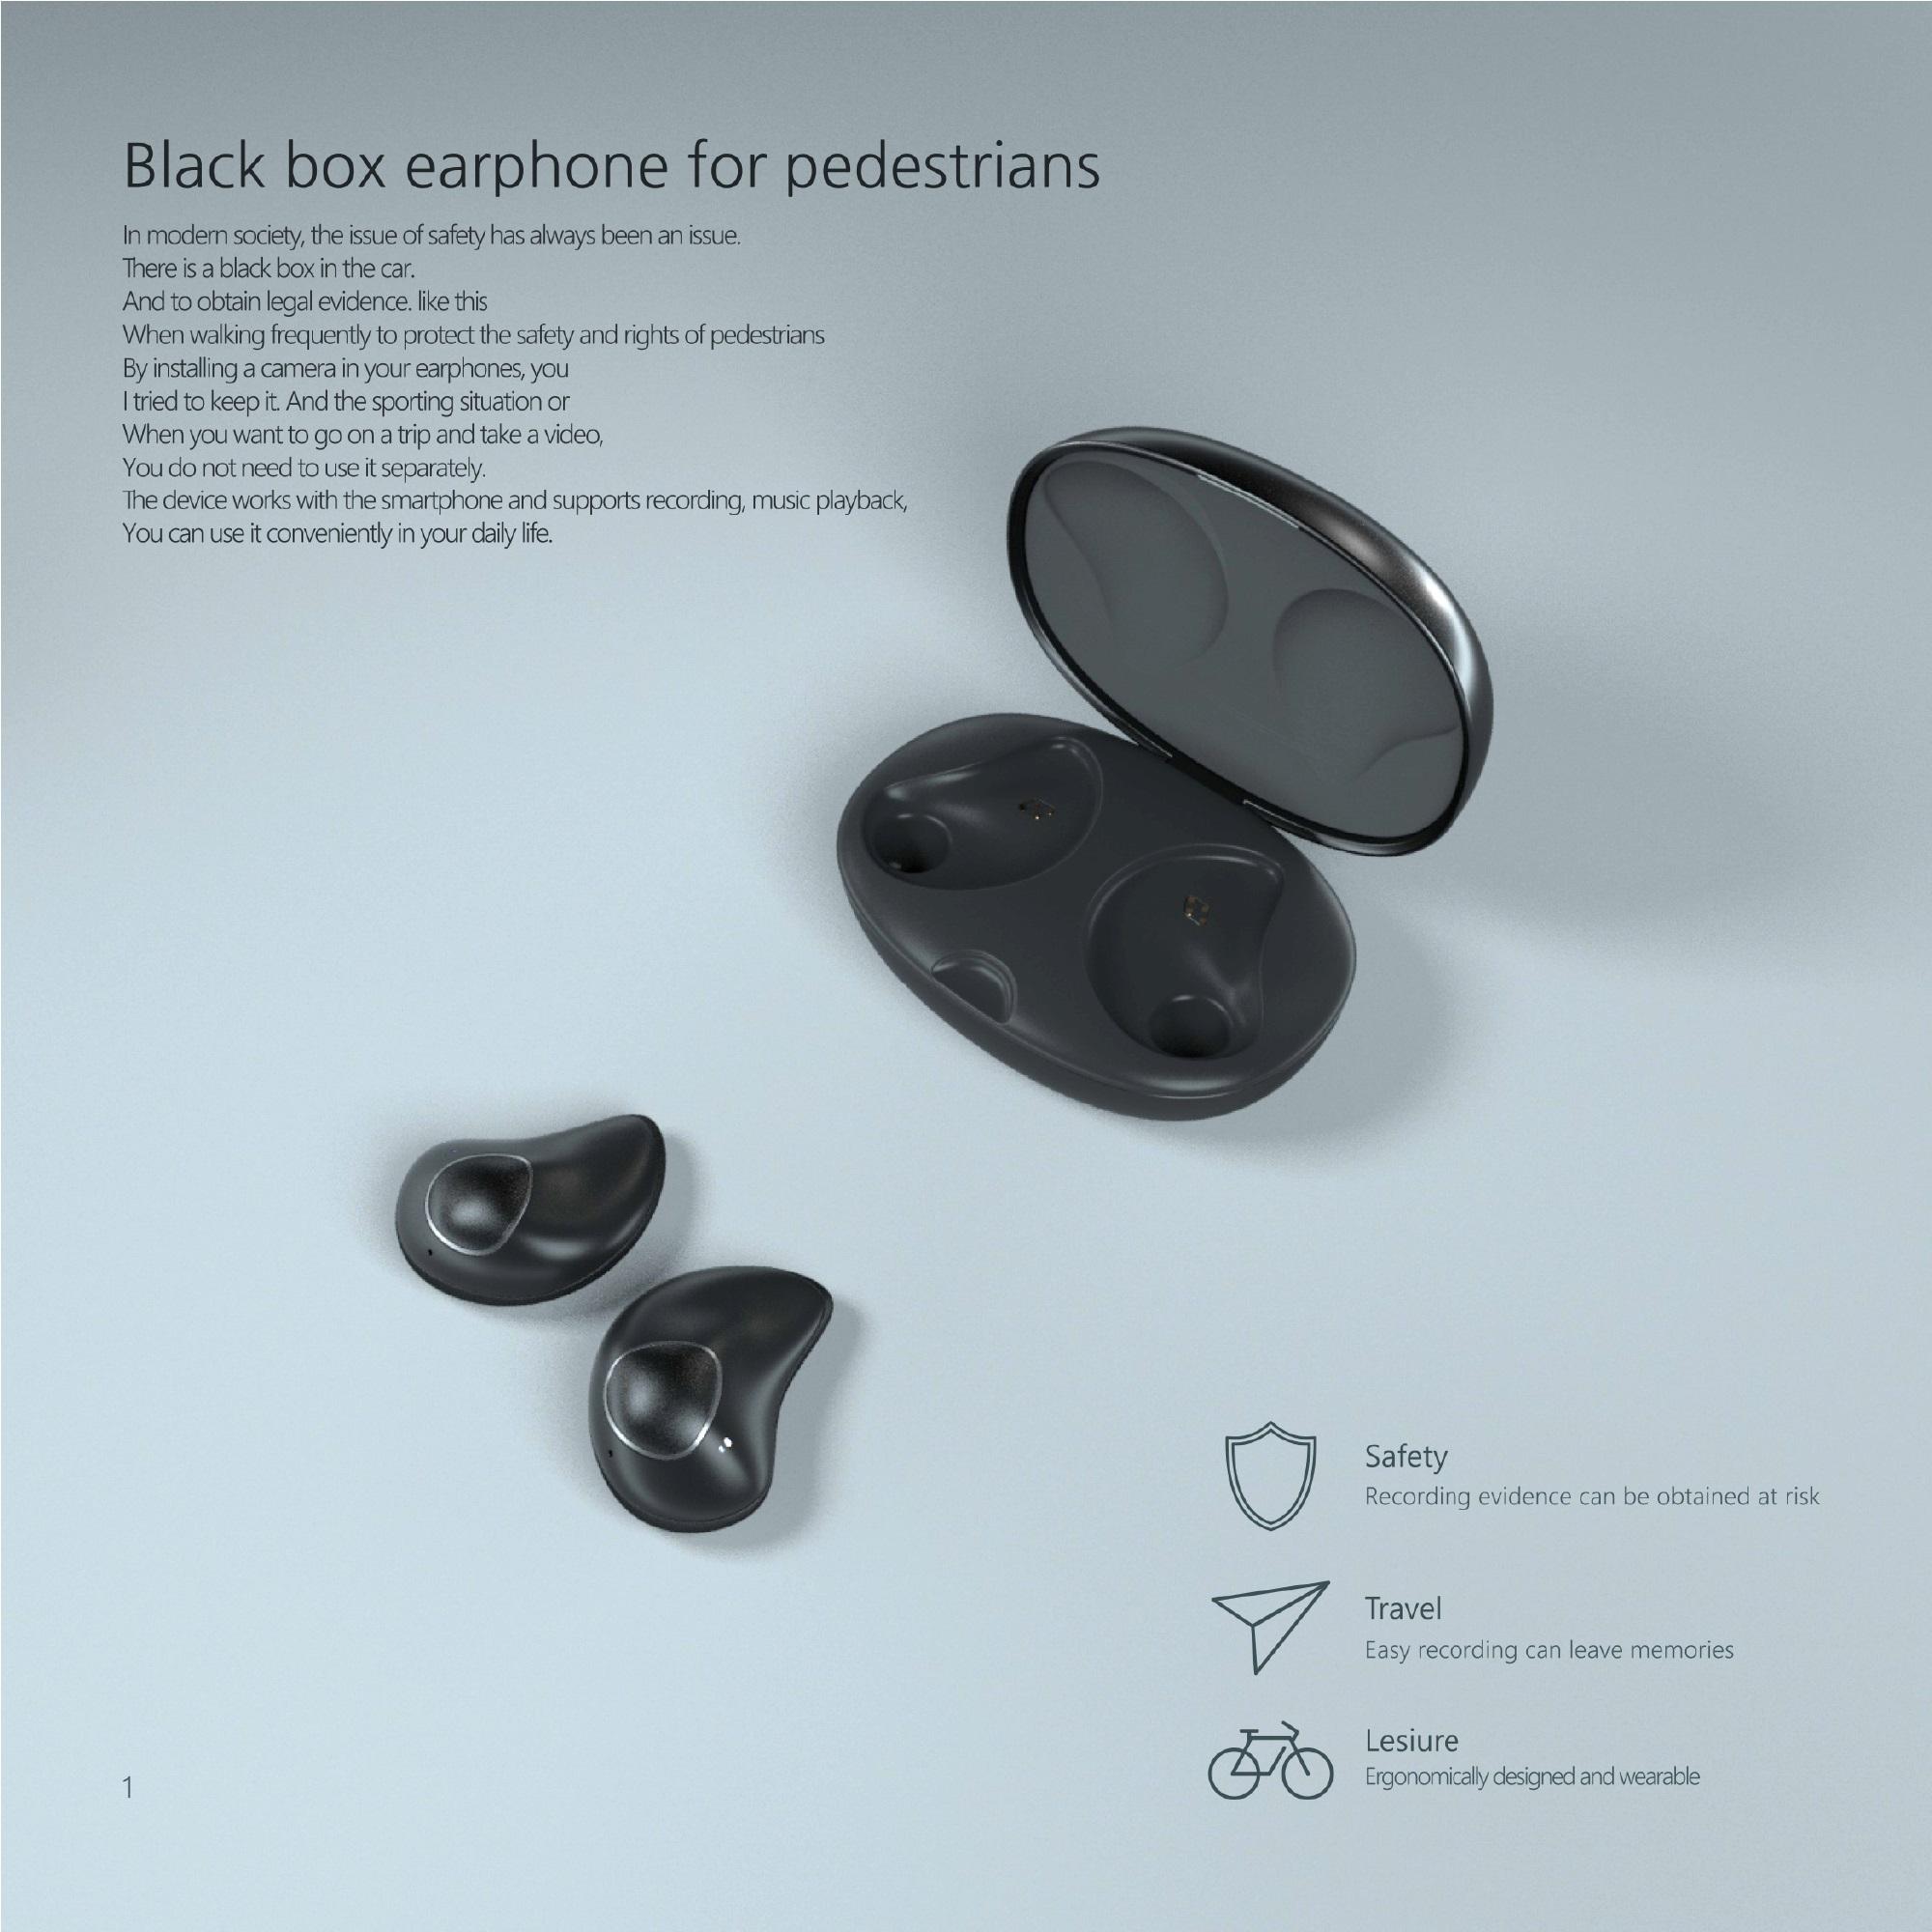 Black Box earphone photo 00